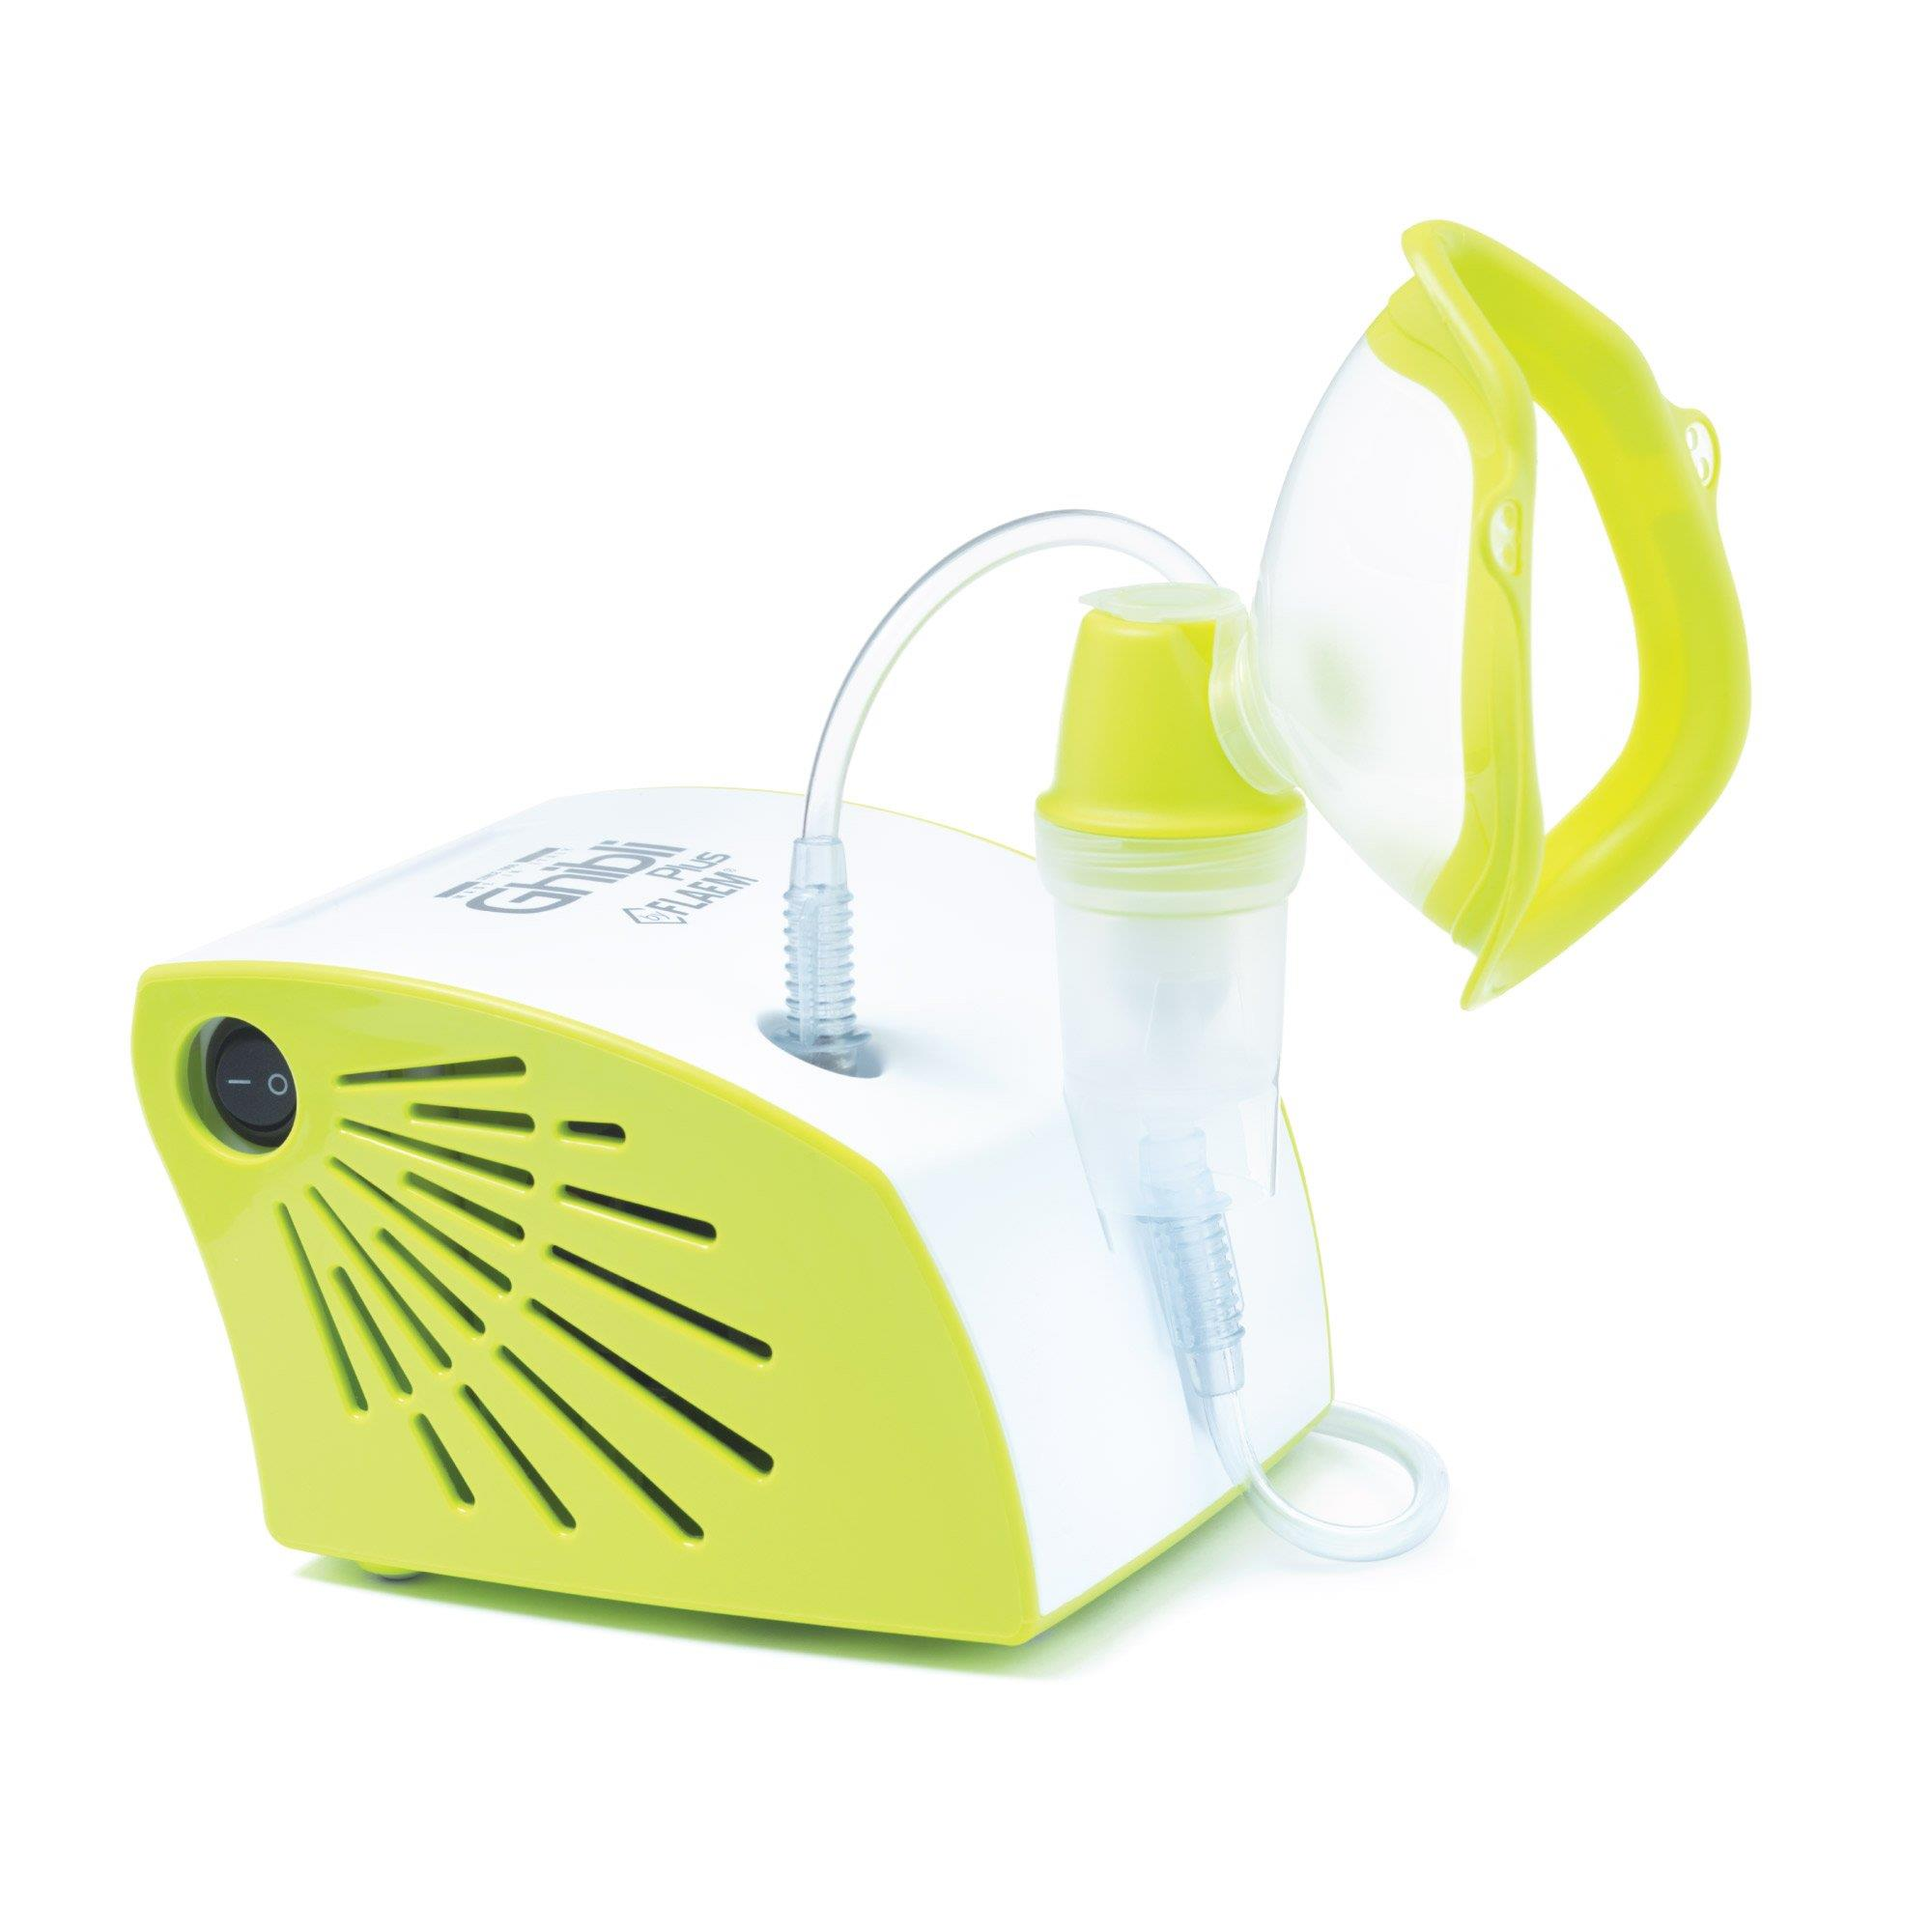 Inhaler pneumatic piston FLAEM Nuova Ghibli Plus Kid (lime color) UISFLMINH0002 inhalators